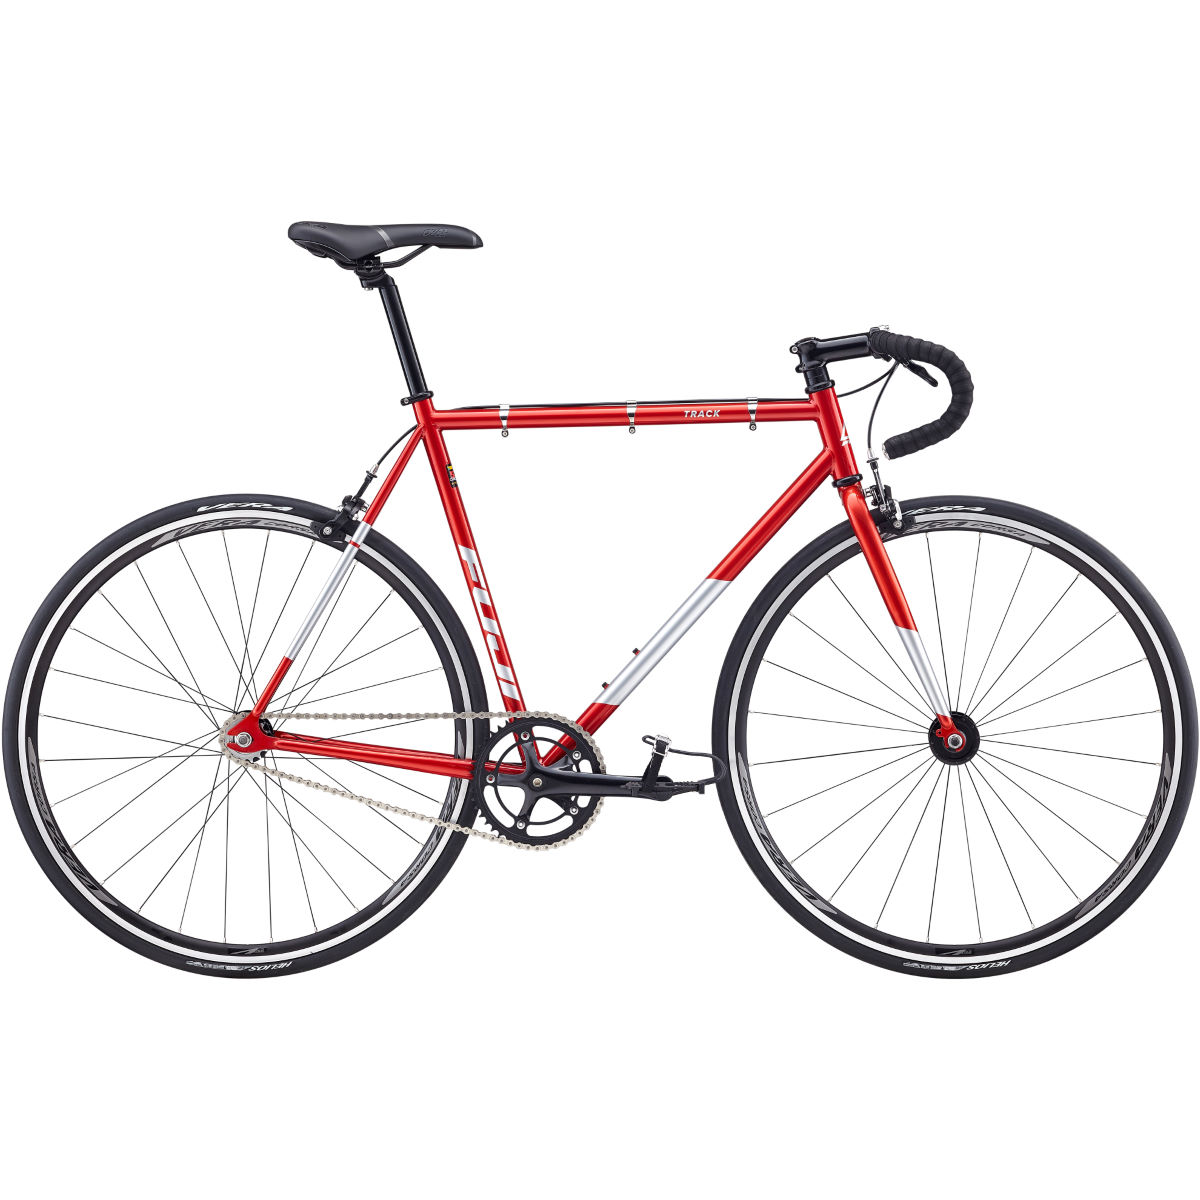 Fuji 2019 Track Bikes